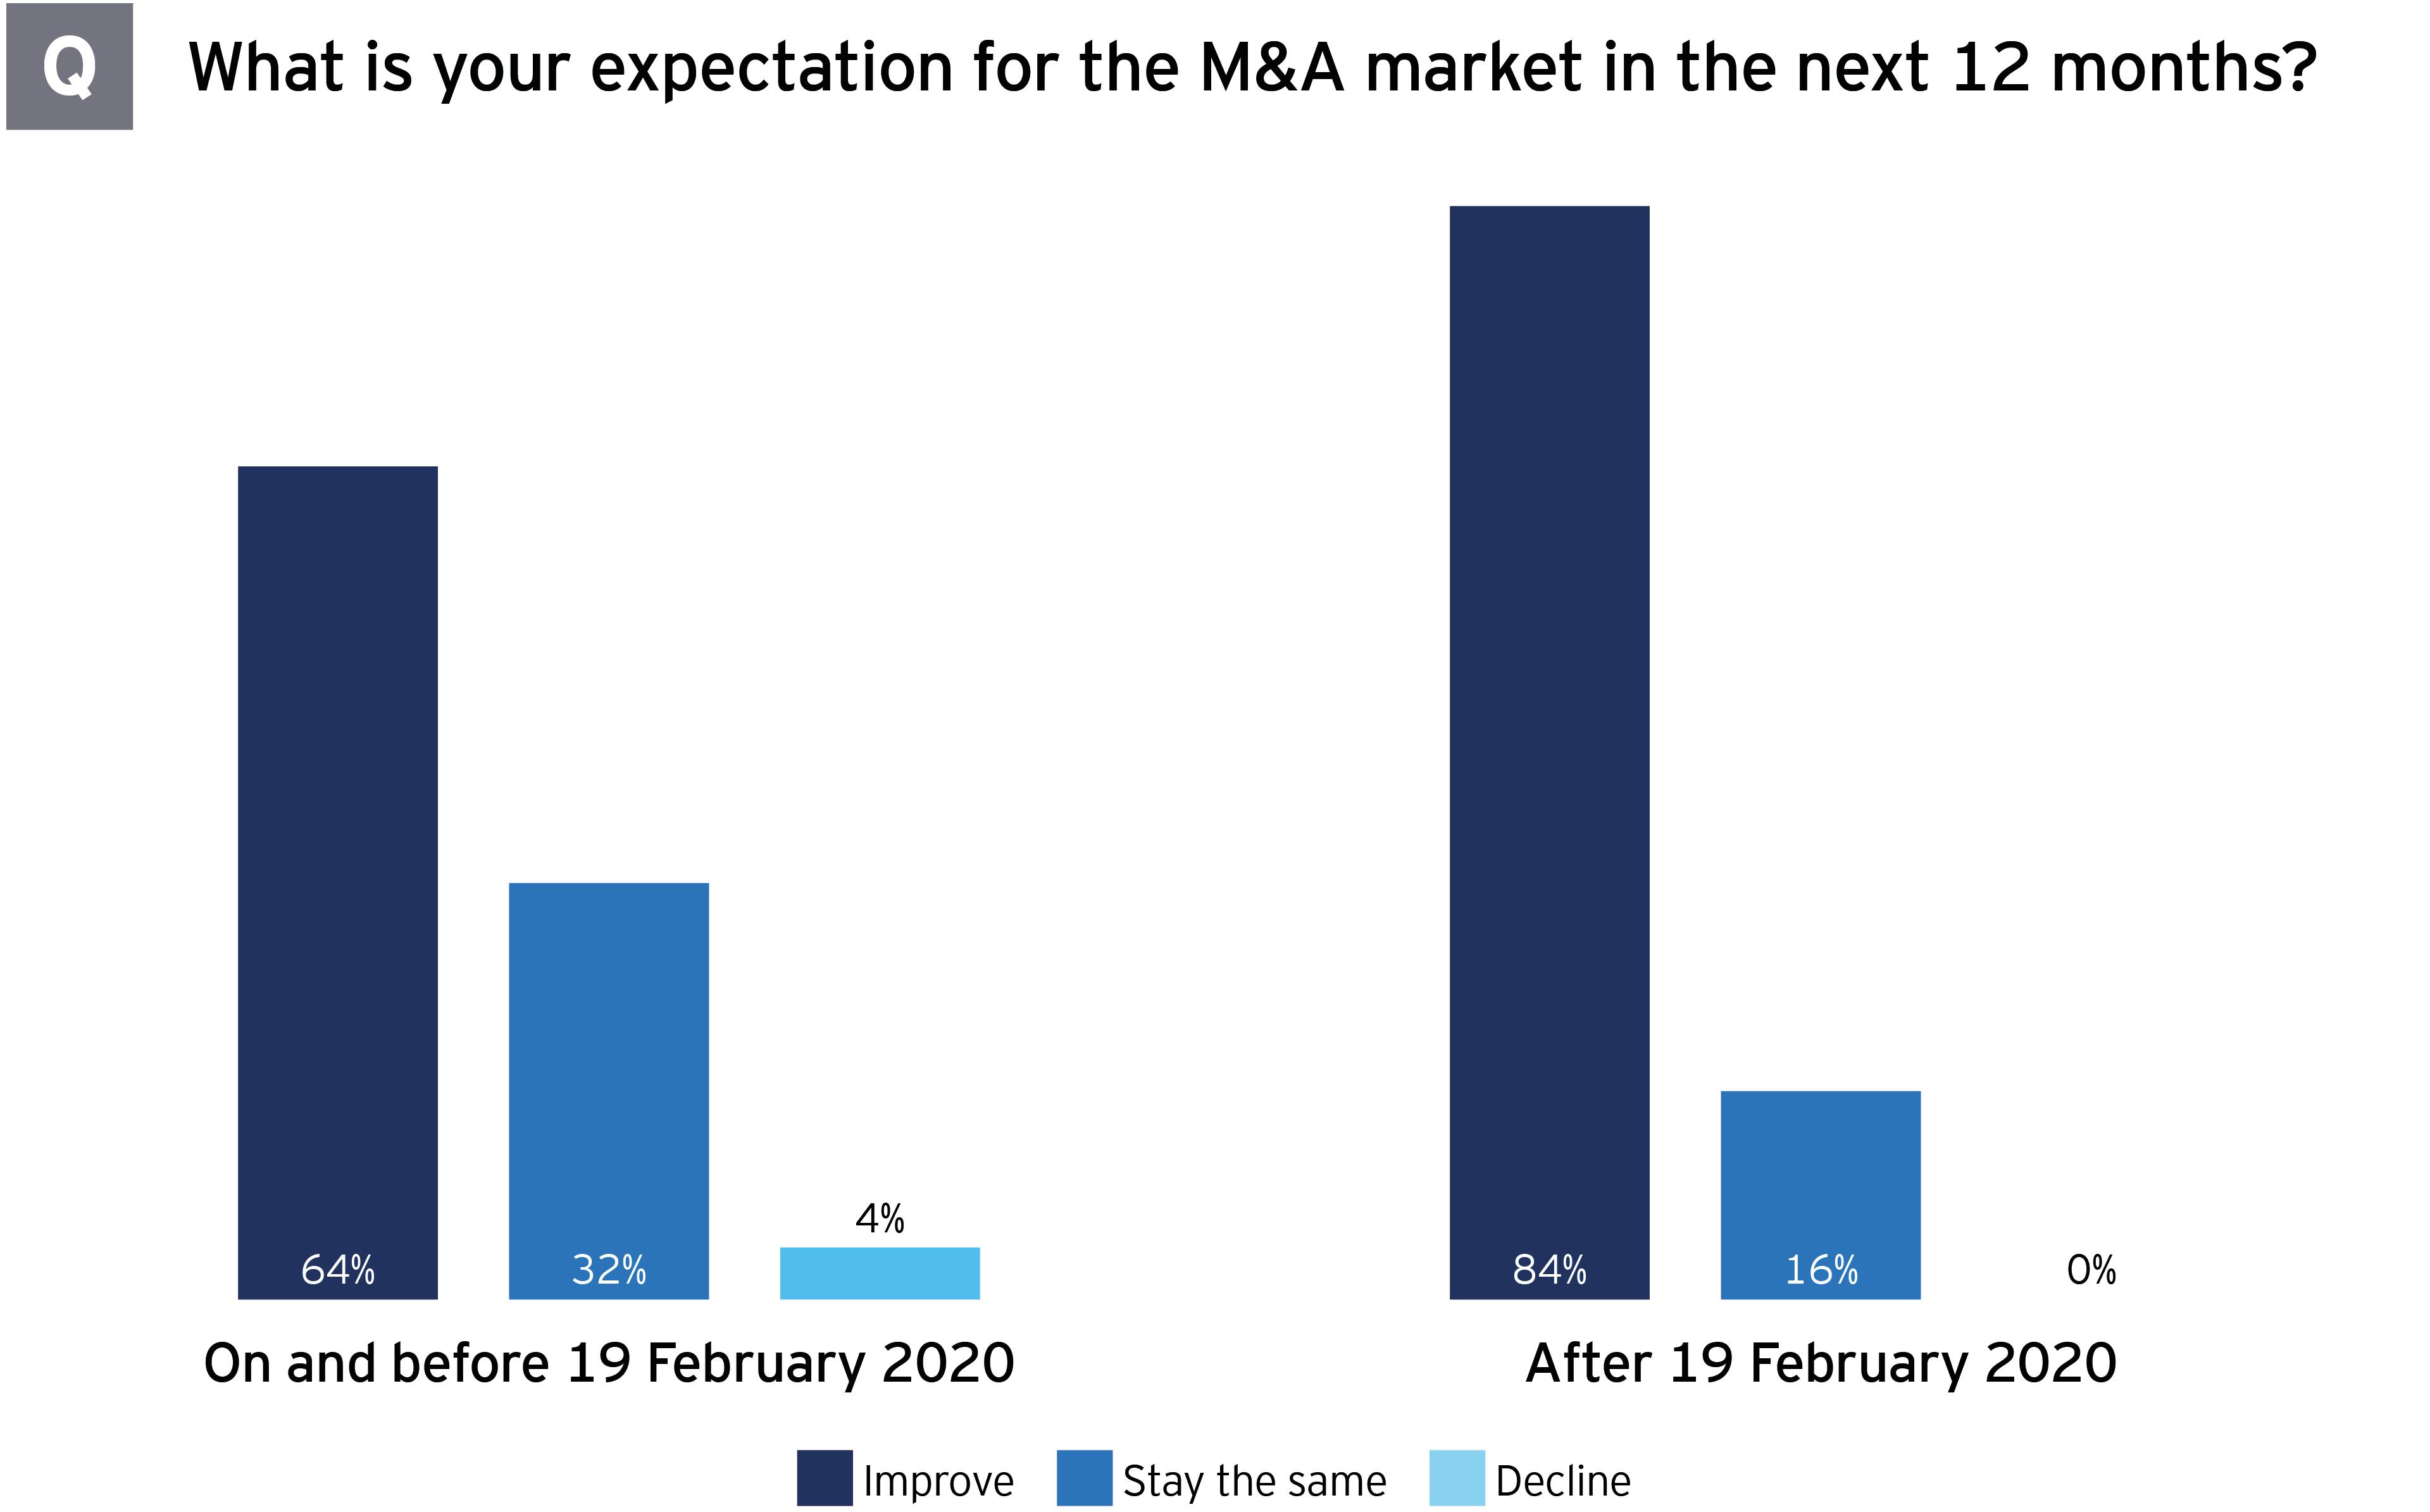 M&A survey Brazil expectations next 12 months